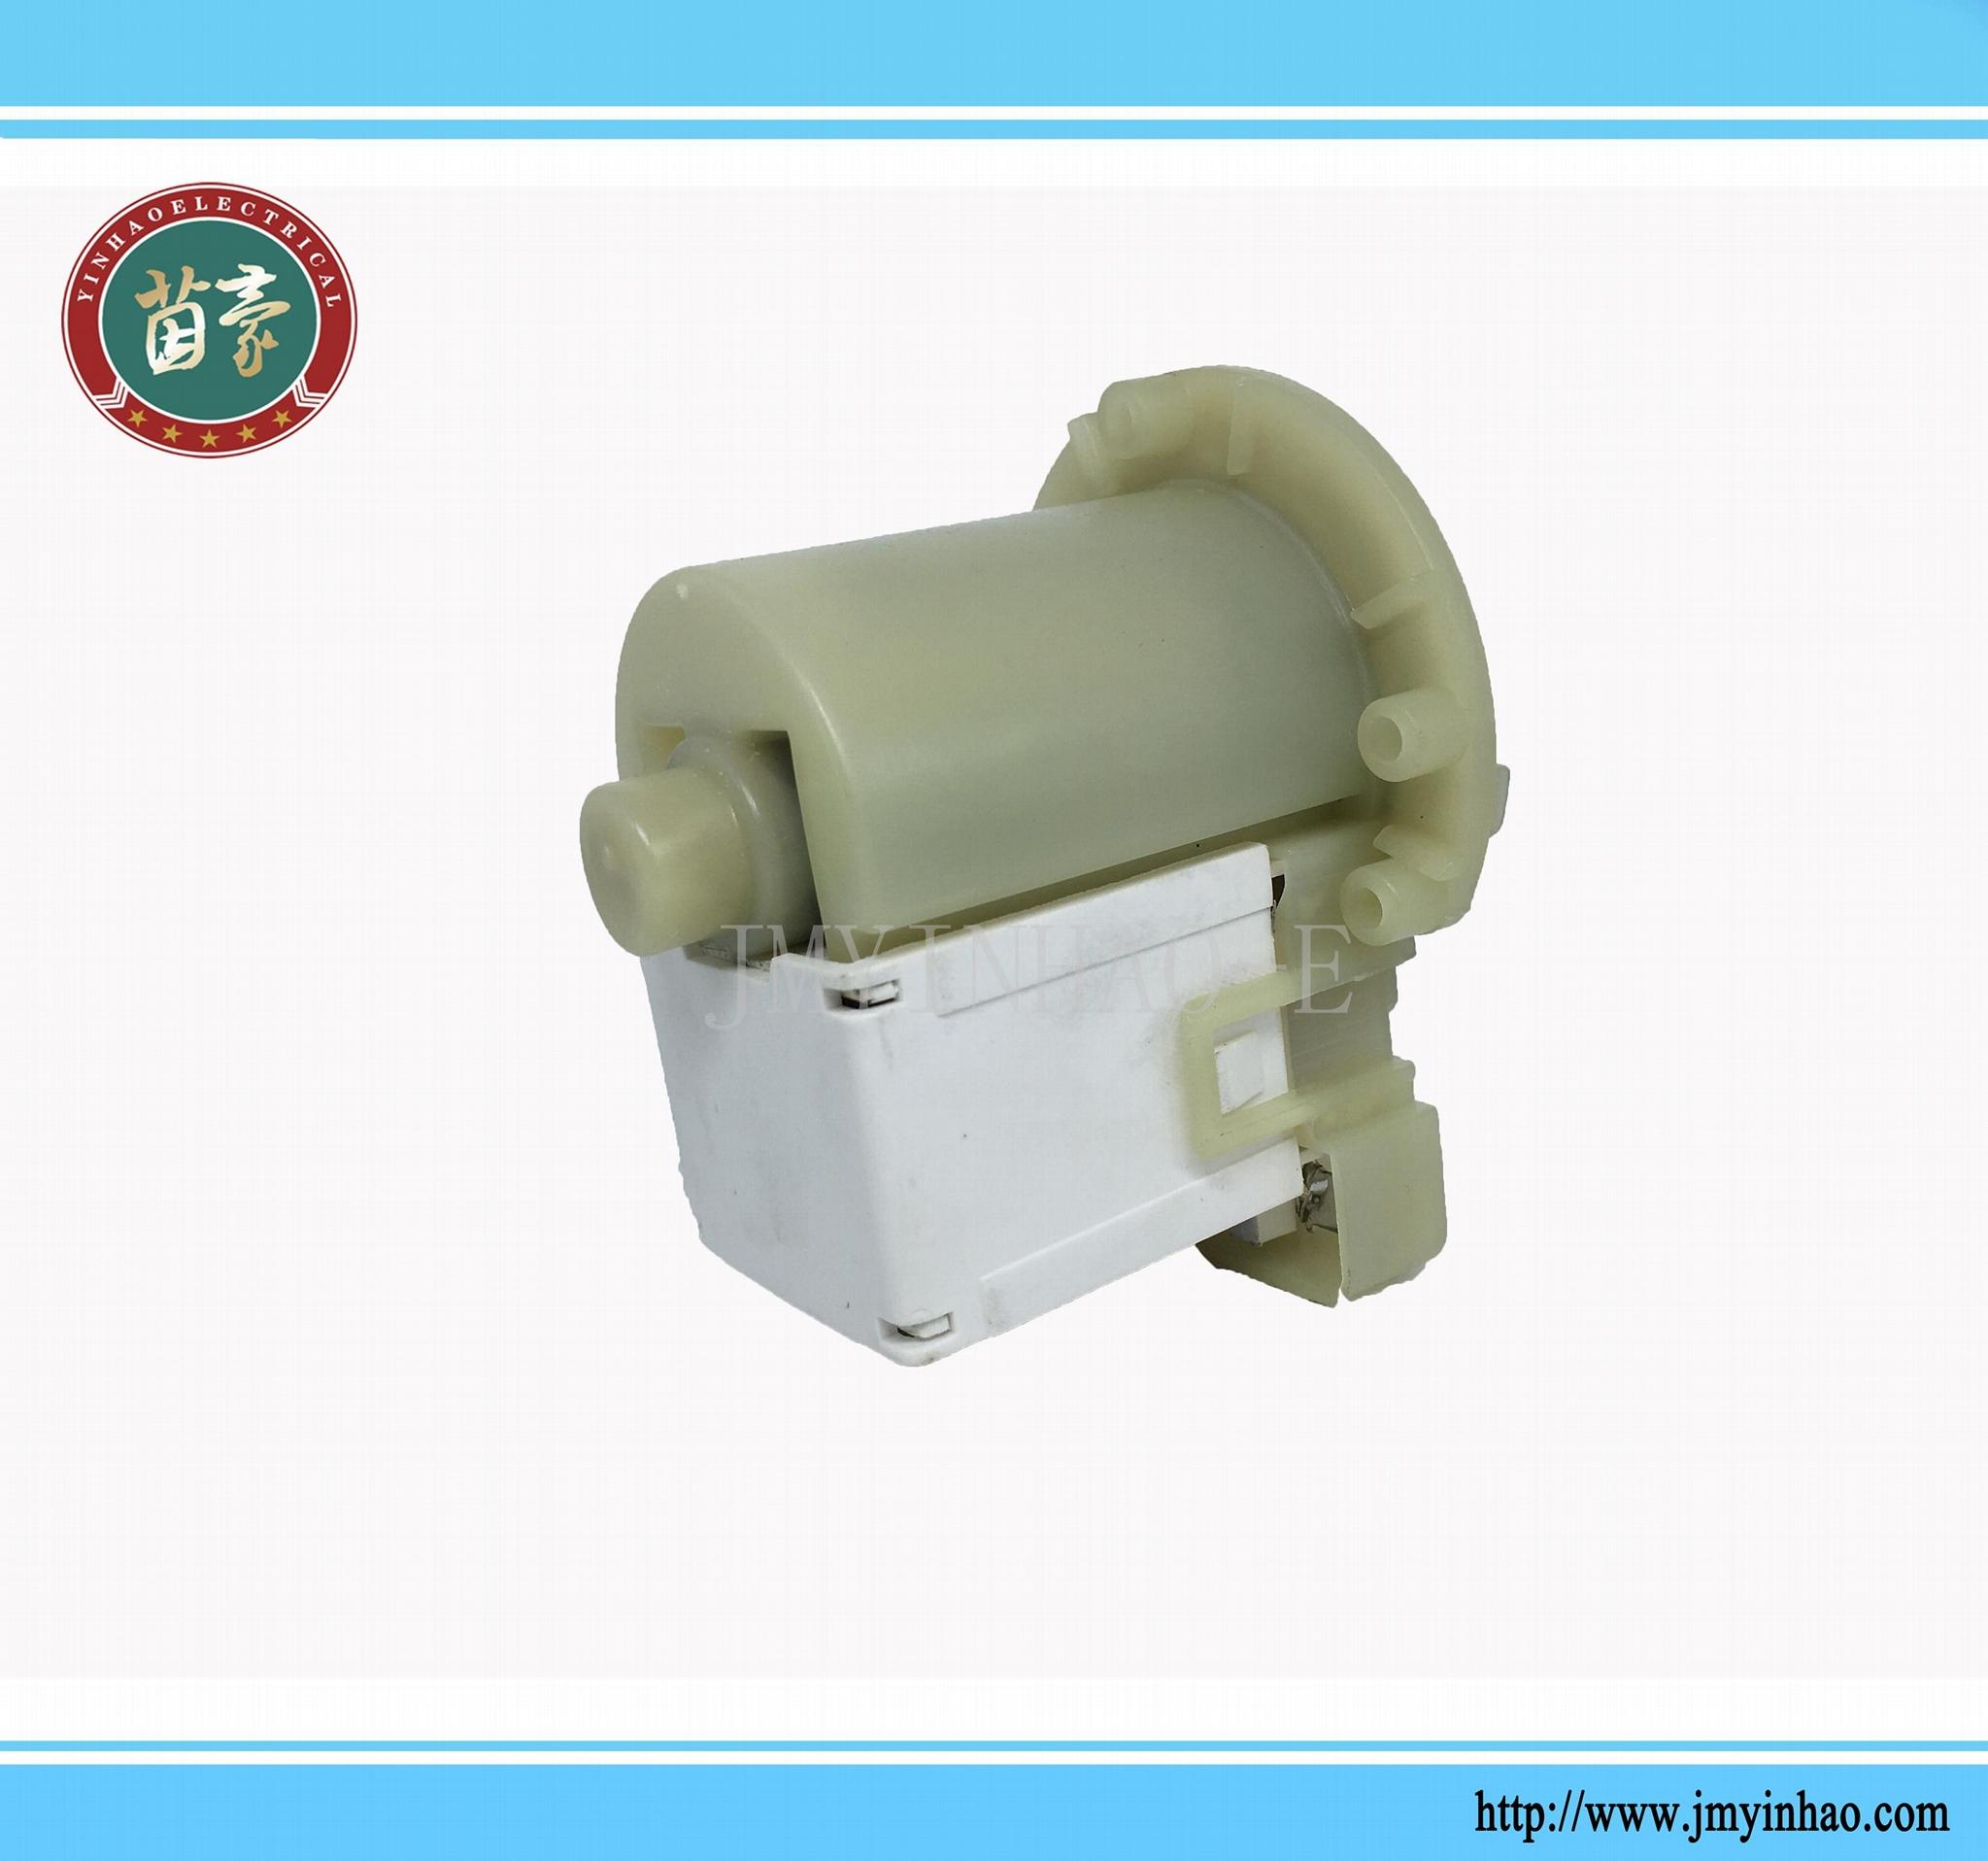 DC31-00054A Washer Drain Pump for Samsung PS4204638 AP4202690 Washing Machine 2